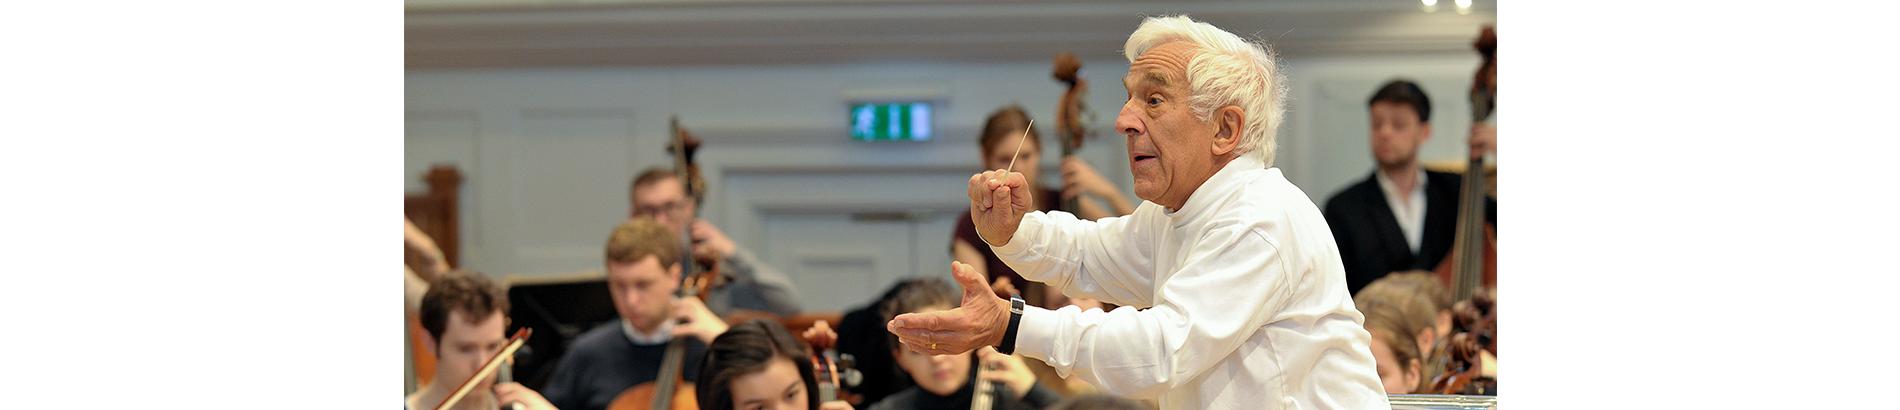 Vladimir Ashkenazy dirige La Mer de Debussy